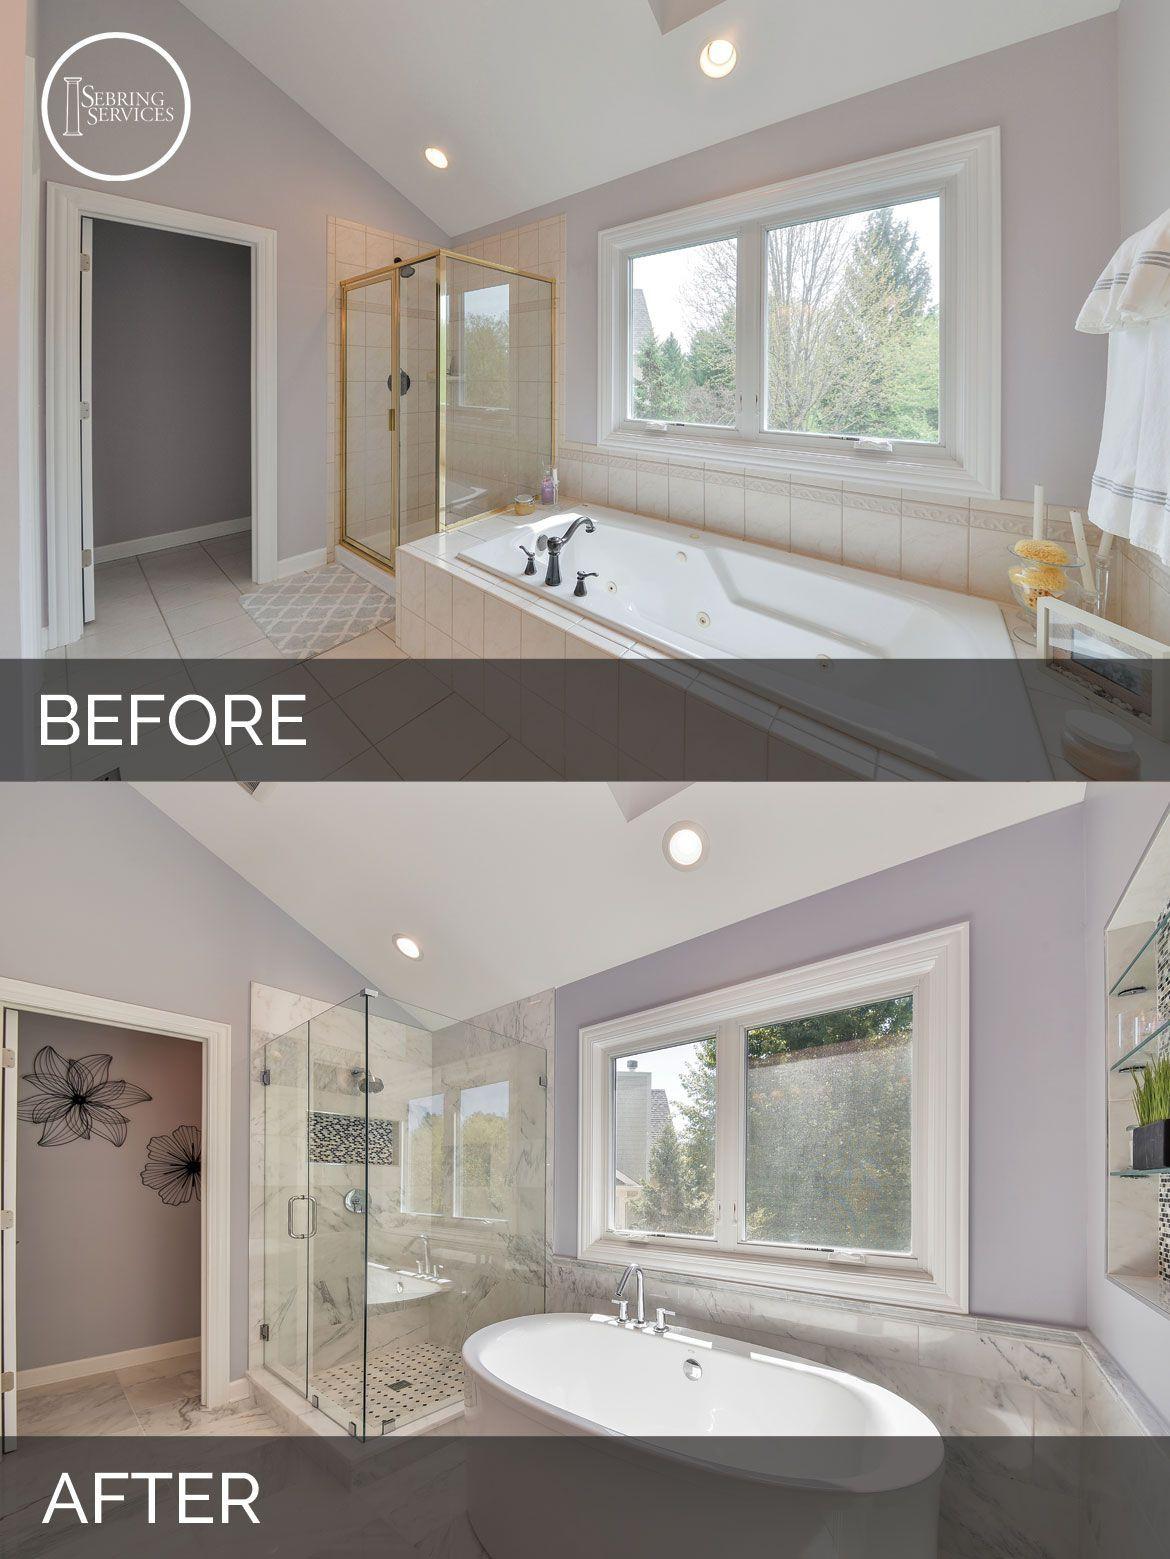 Doug Natalie S Master Bath Before After Pictures Bathroom Remodel Master Bathrooms Remodel Master Bathroom Renovation